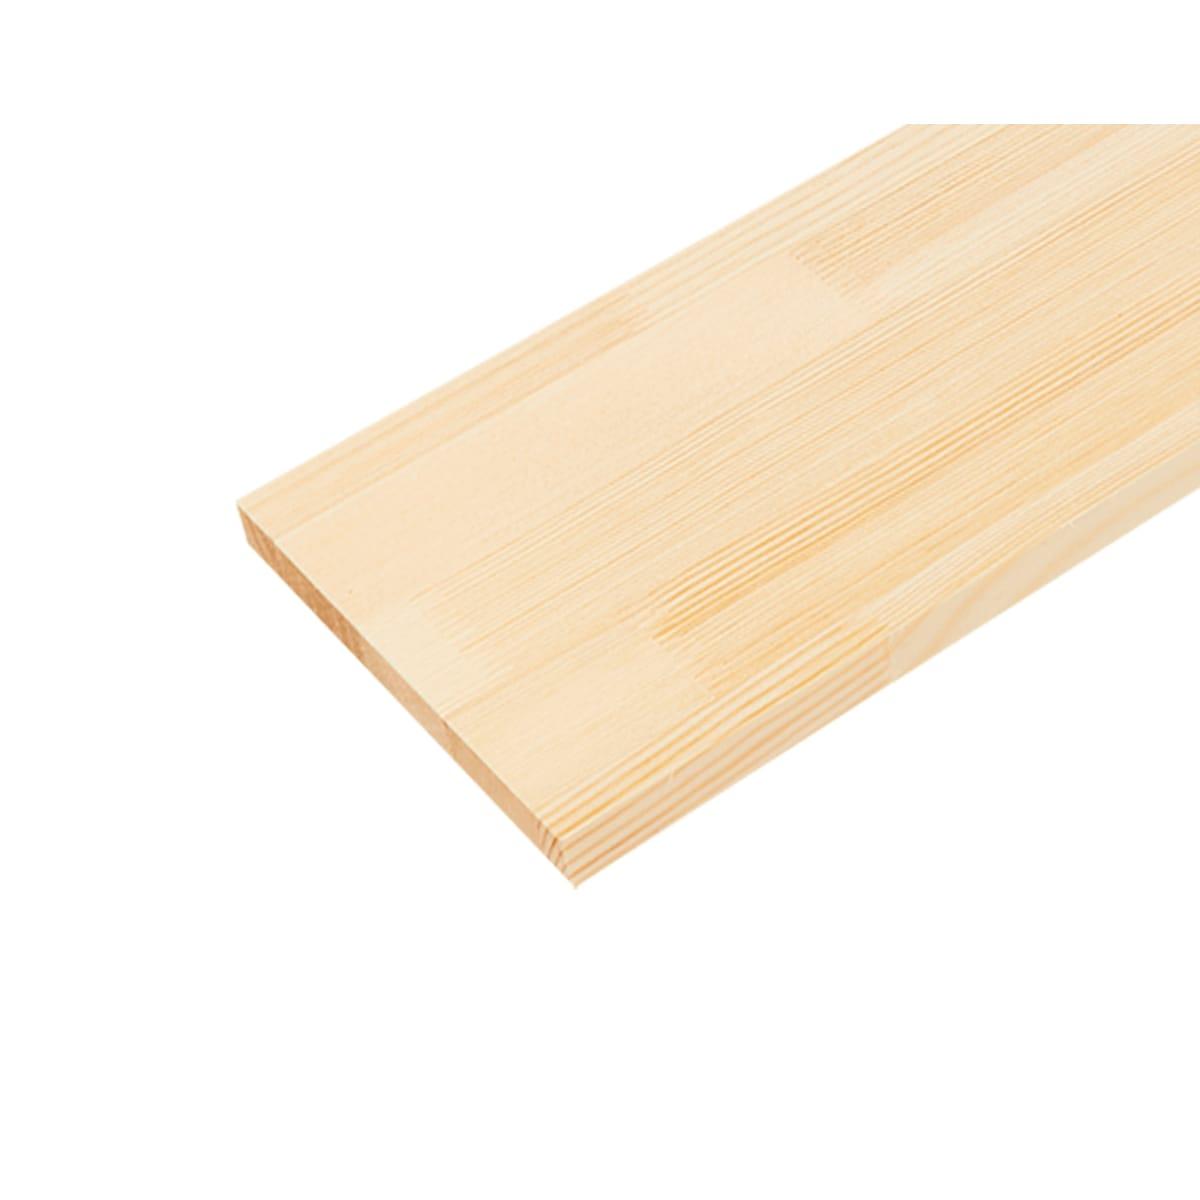 Панель деревянная экстра 11х120х1500 мм